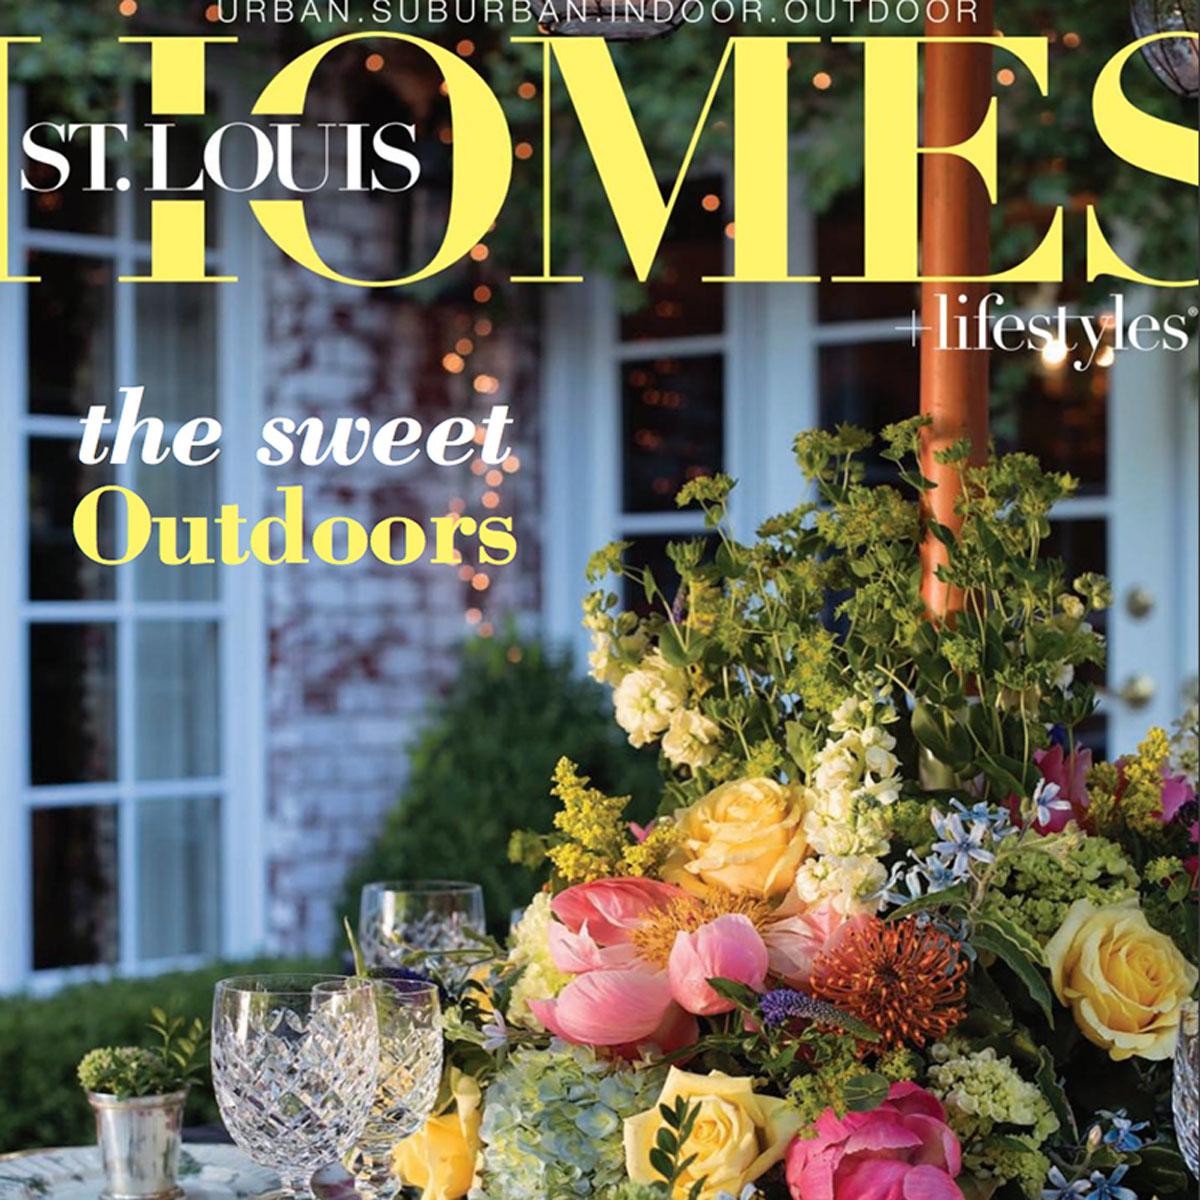 St. Louis Home & Lifestyles Magazine June 2018